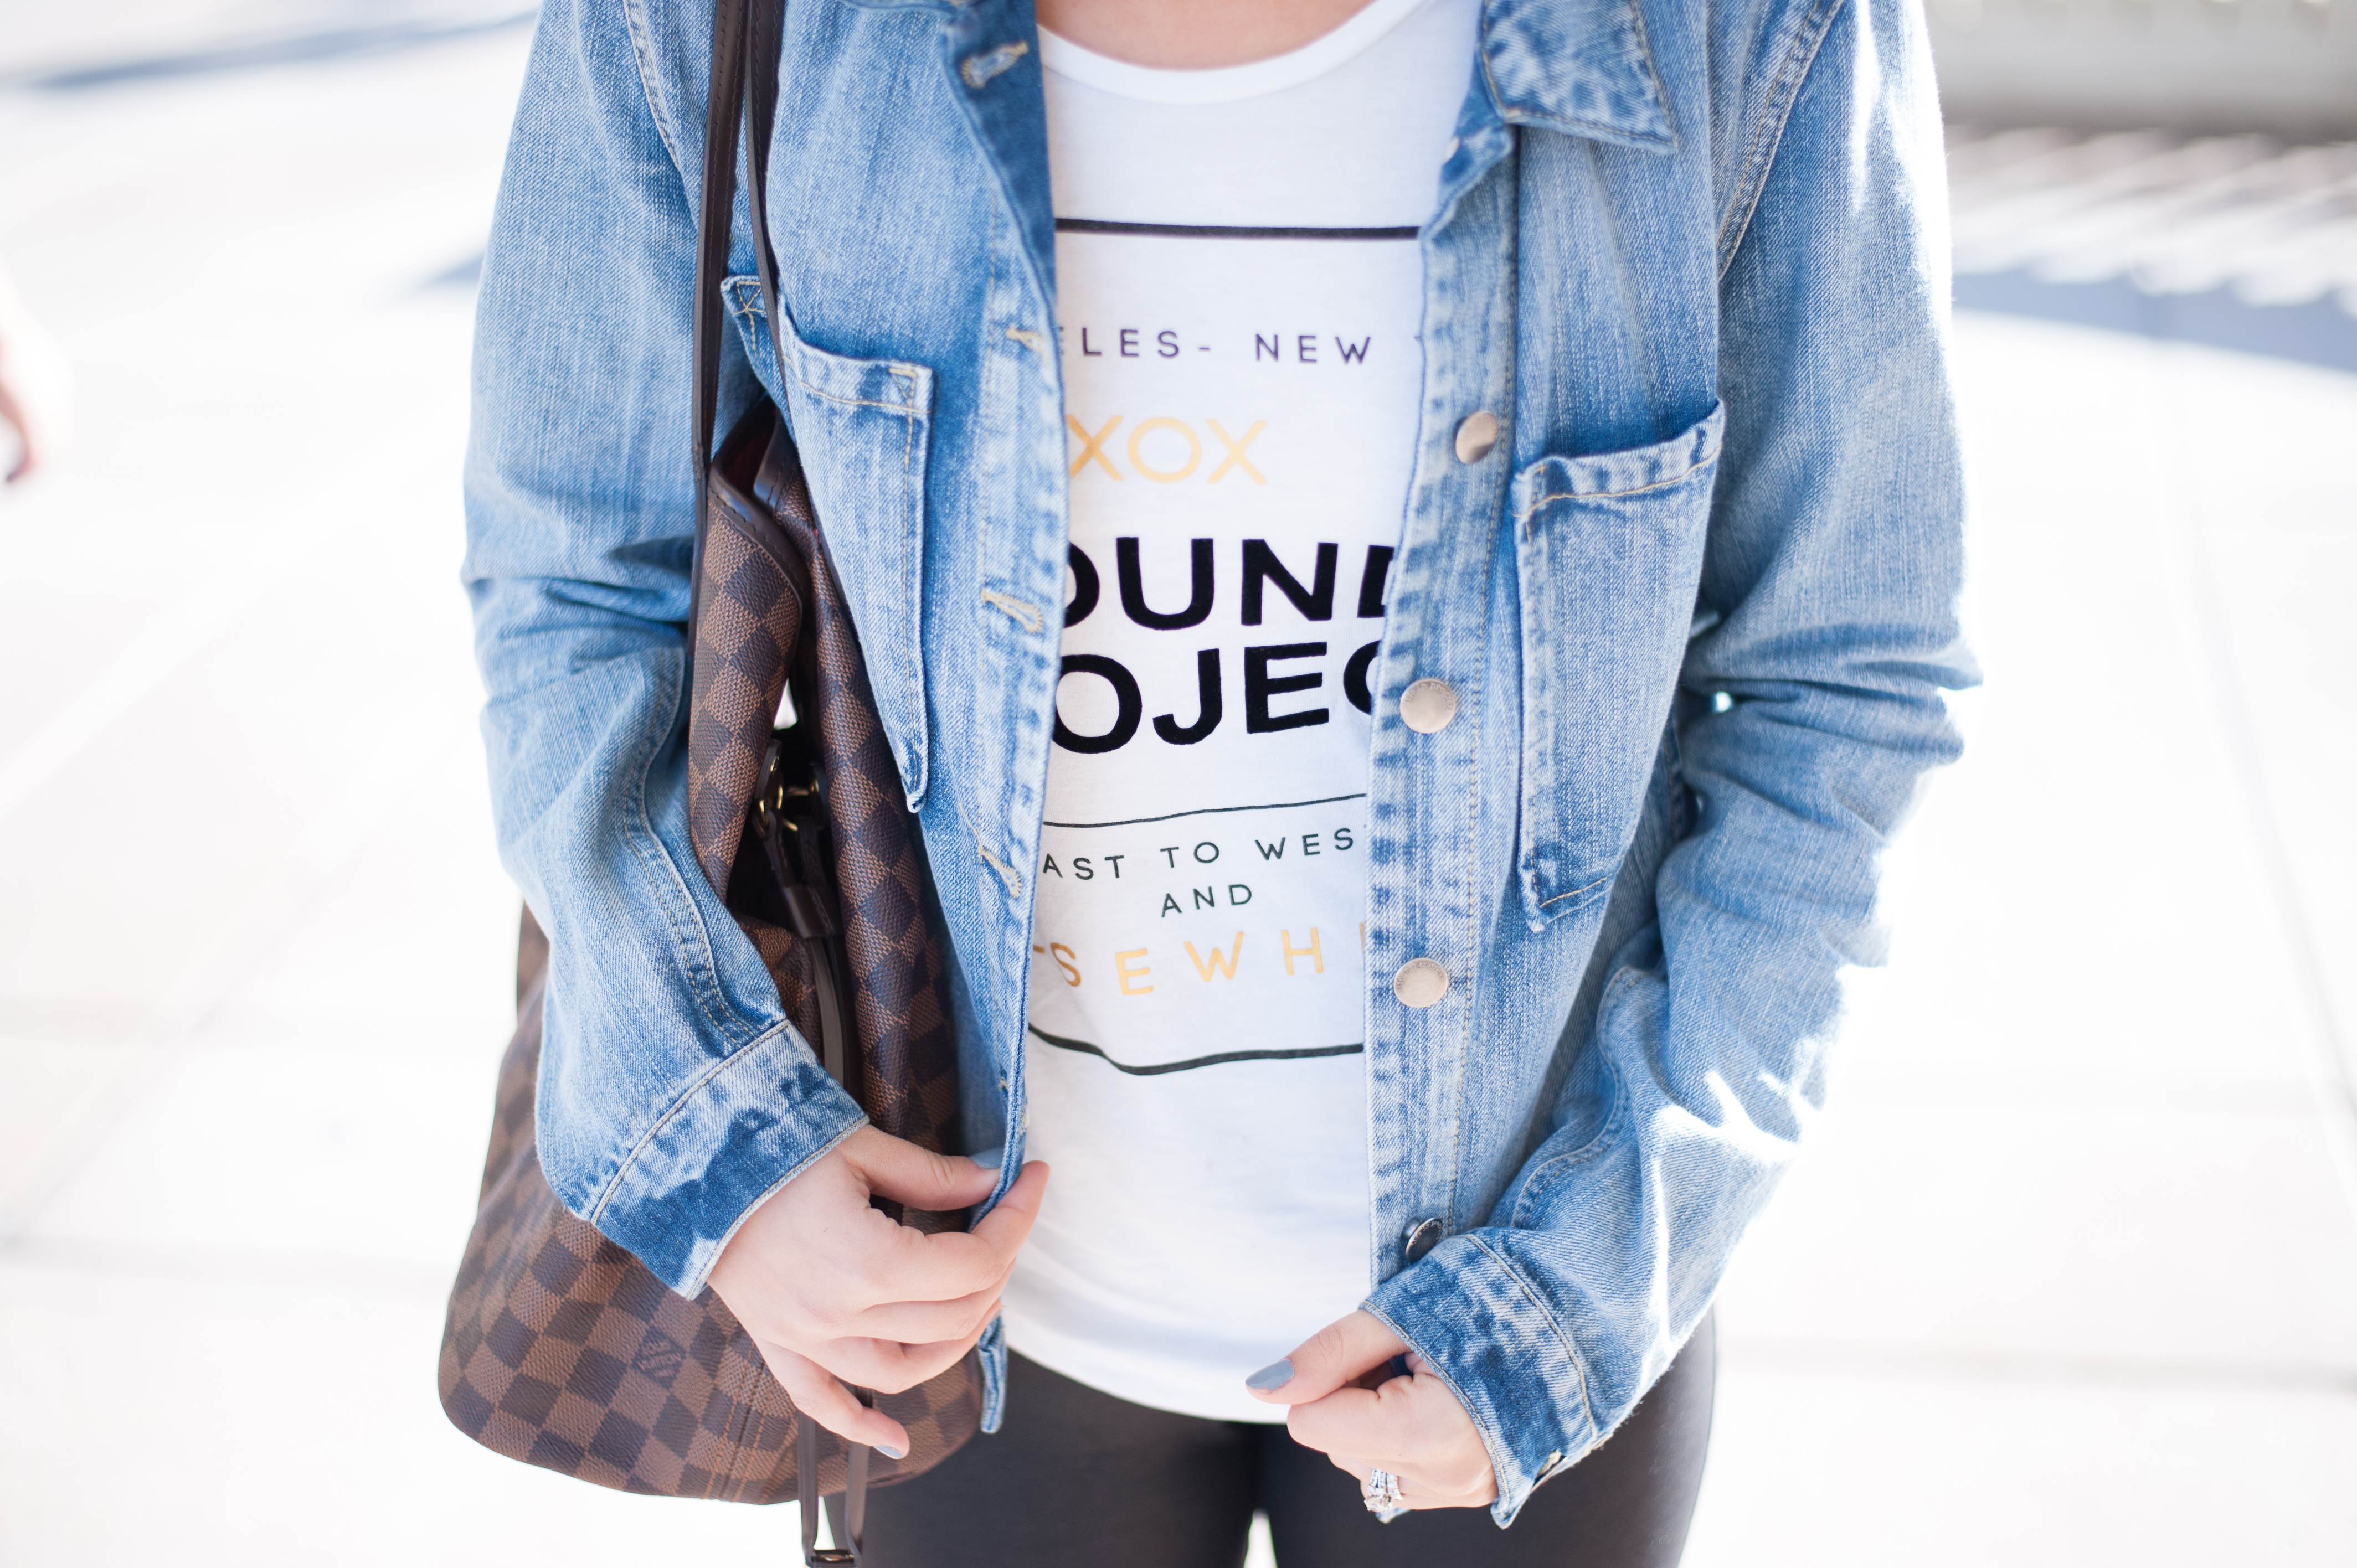 dress_up_buttercup_cartoon_network_powerpuff_dede_raad_fashion_blogger_houston (7 of 10)